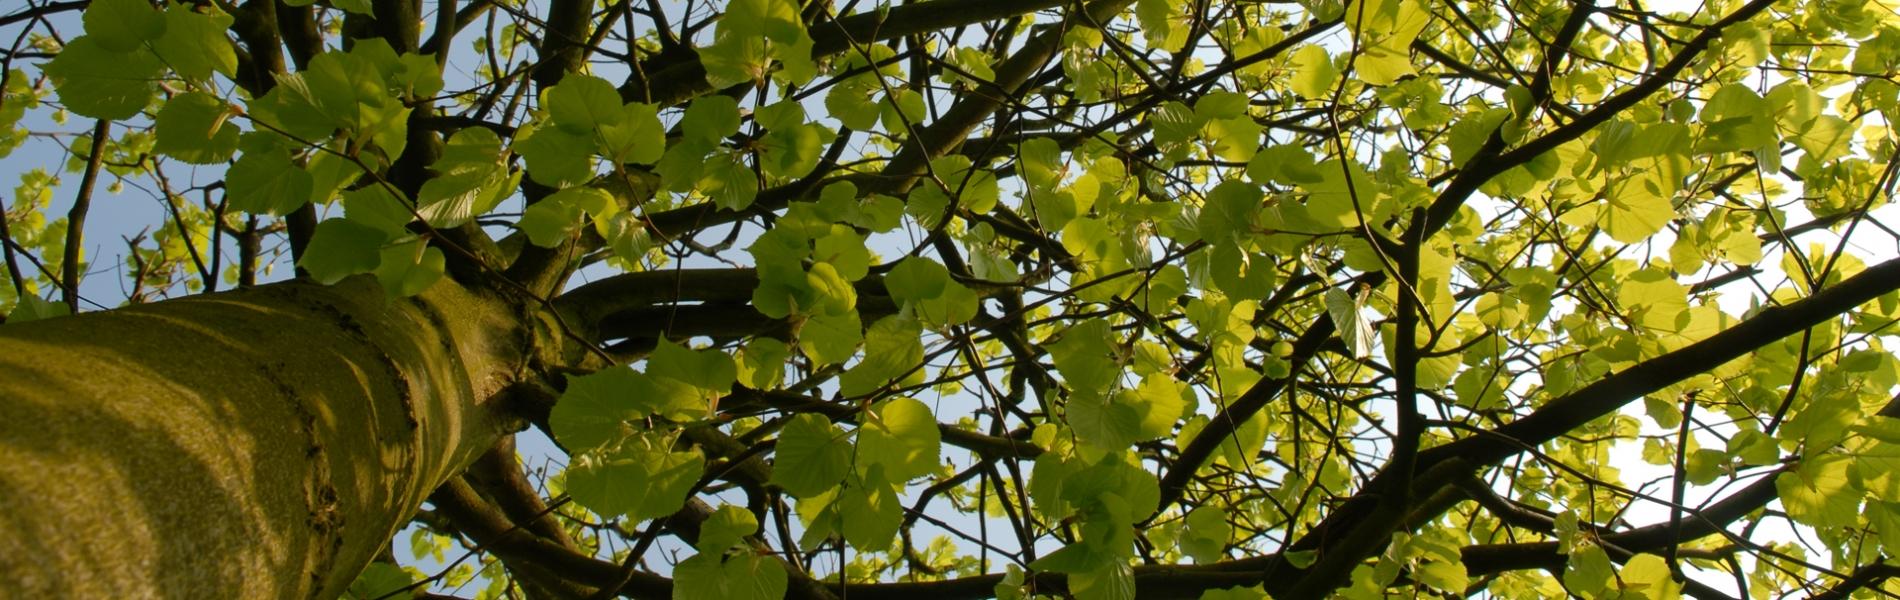 bomen vier seizoenen